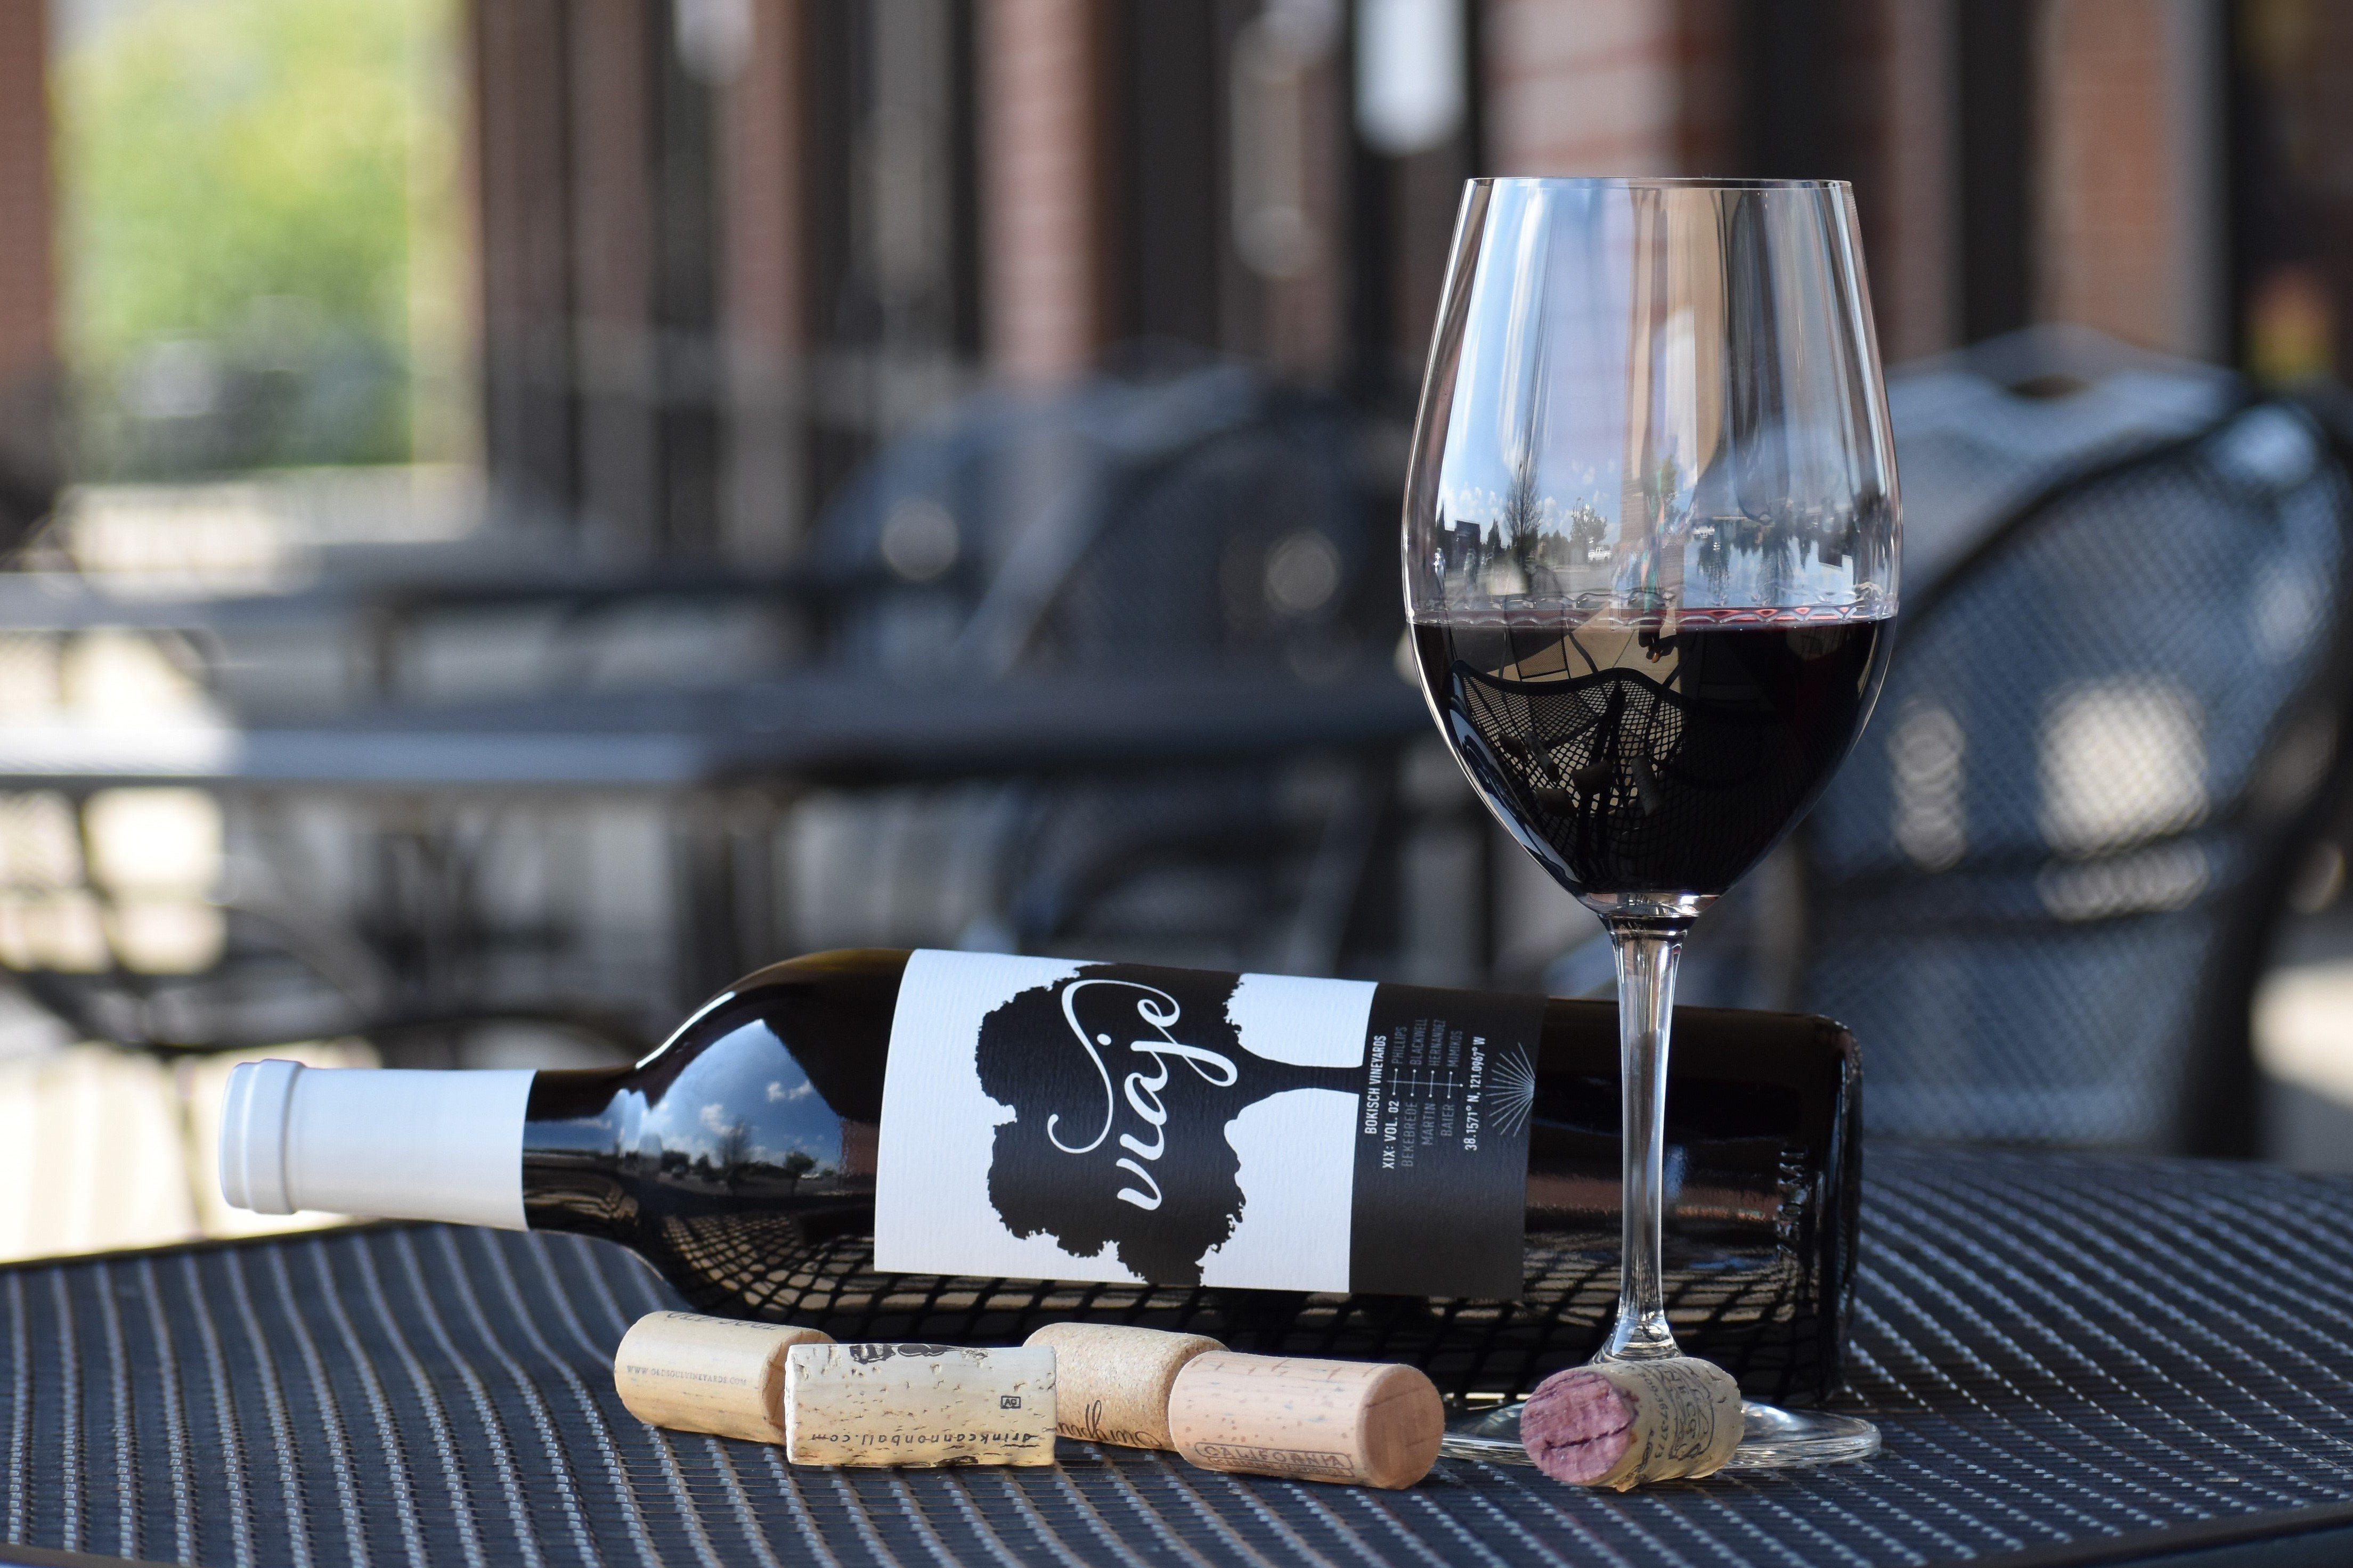 Missouri State University wine tasting